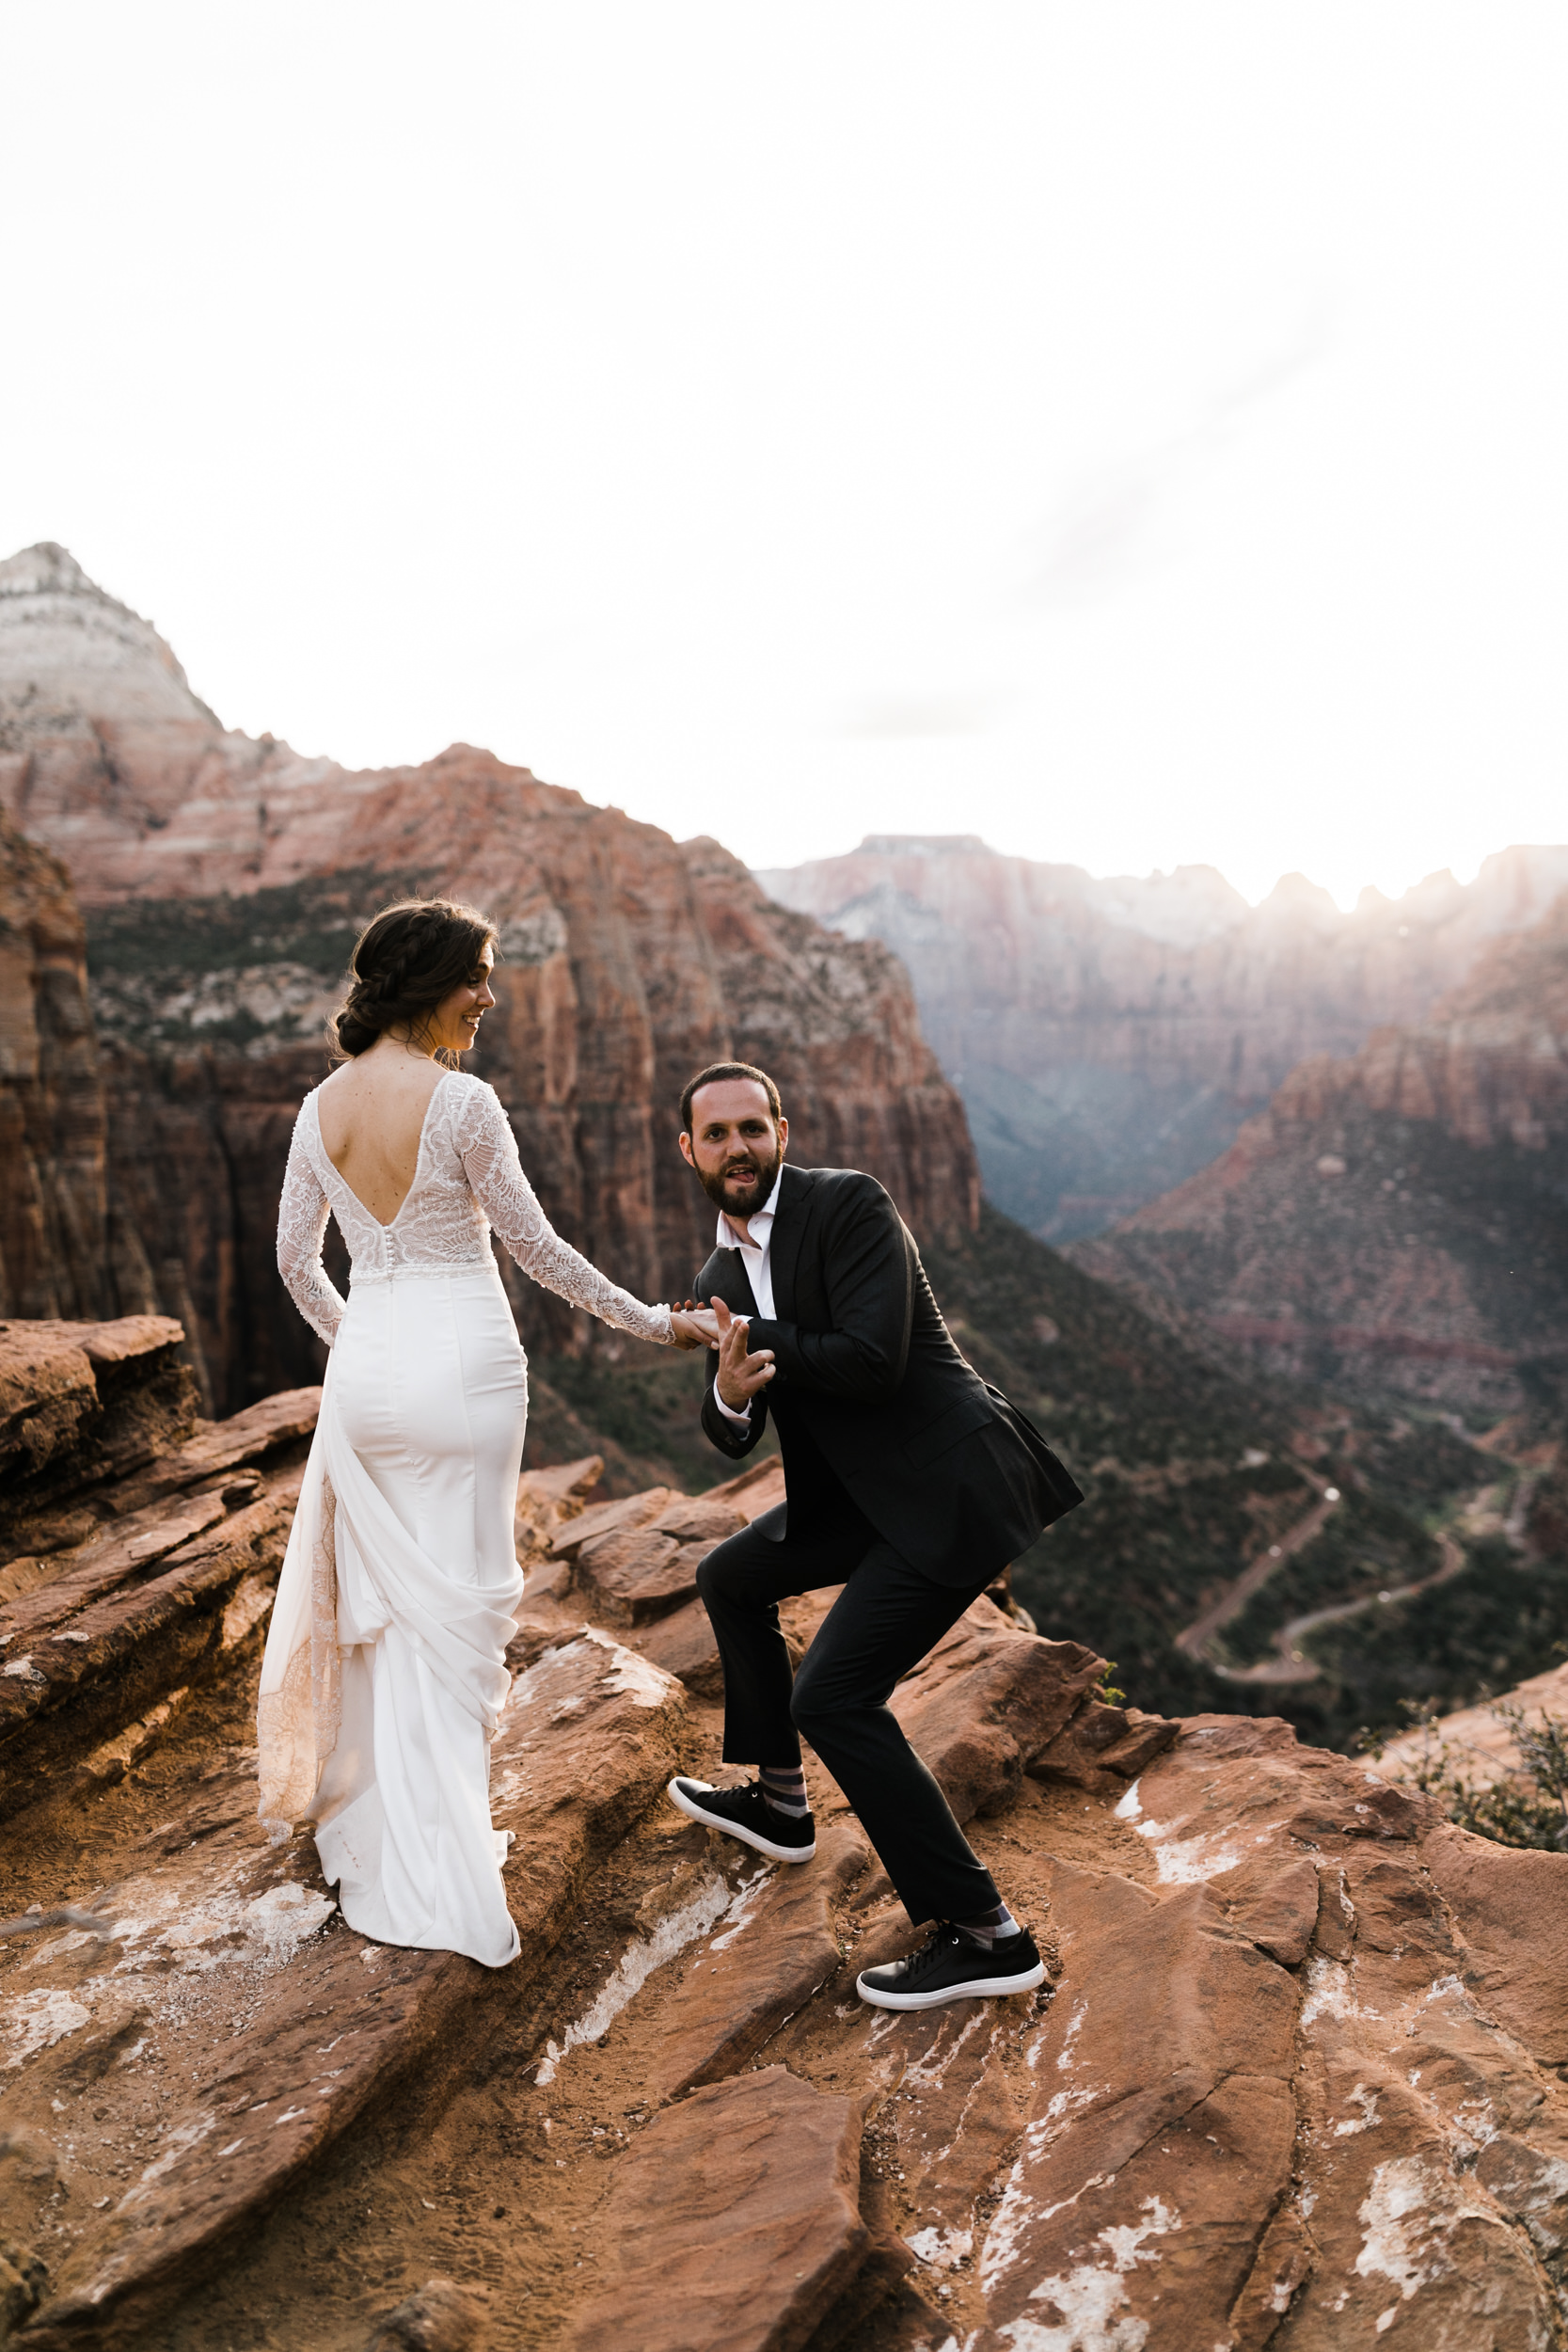 Zion-National-Park-Adventure-Wedding-Hearnes-Elopement-Photography-56.jpg